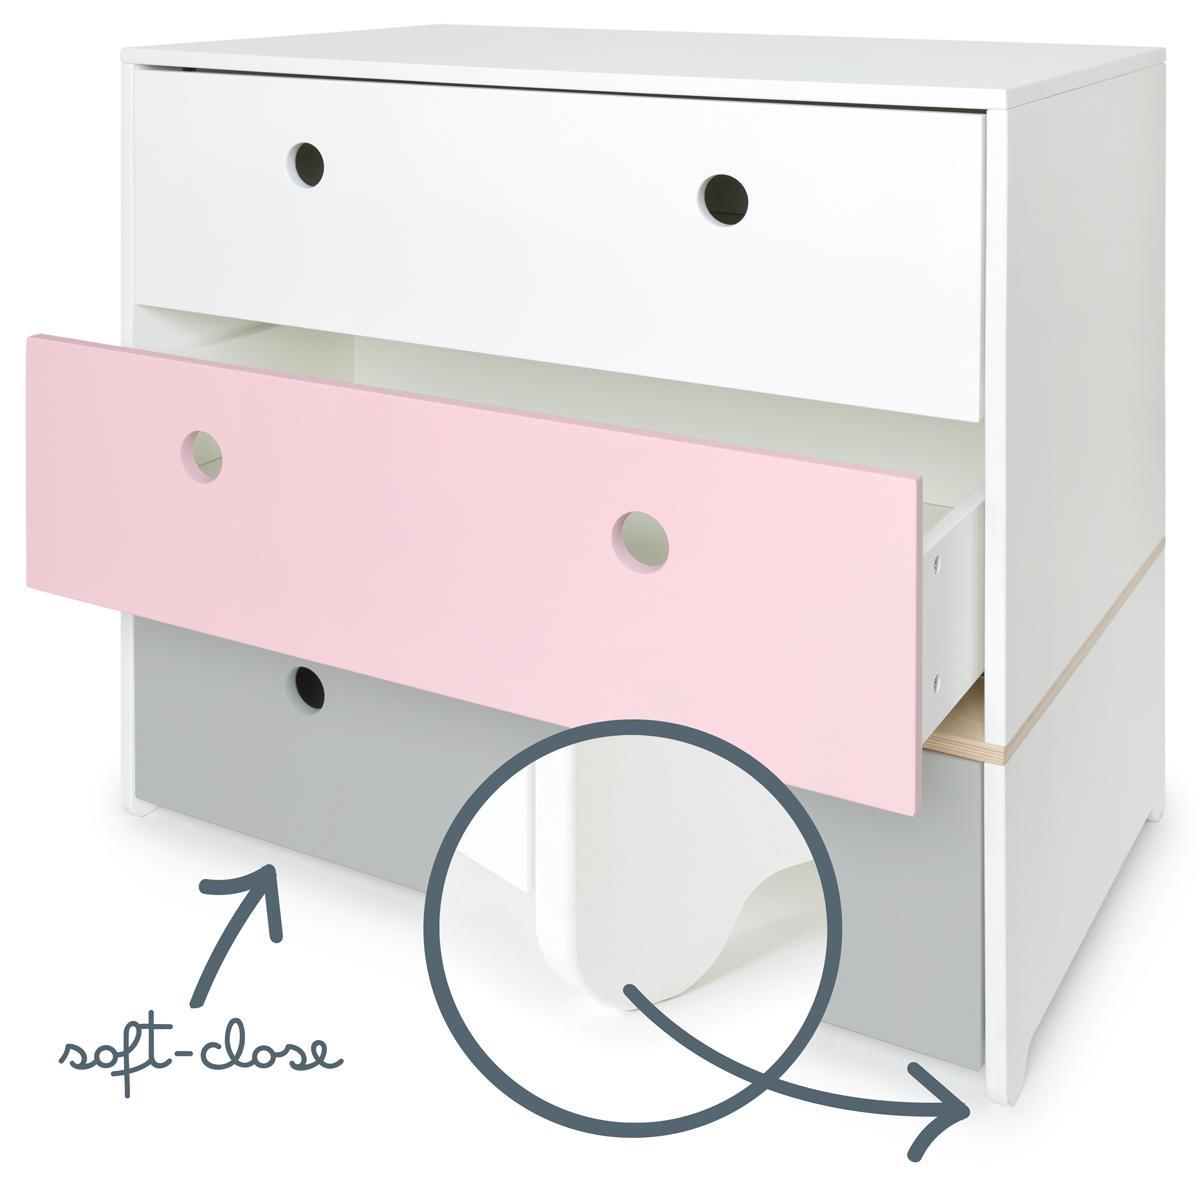 Kommode COLORFLEX Schubladen Farben white-sweet pink-pearl grey